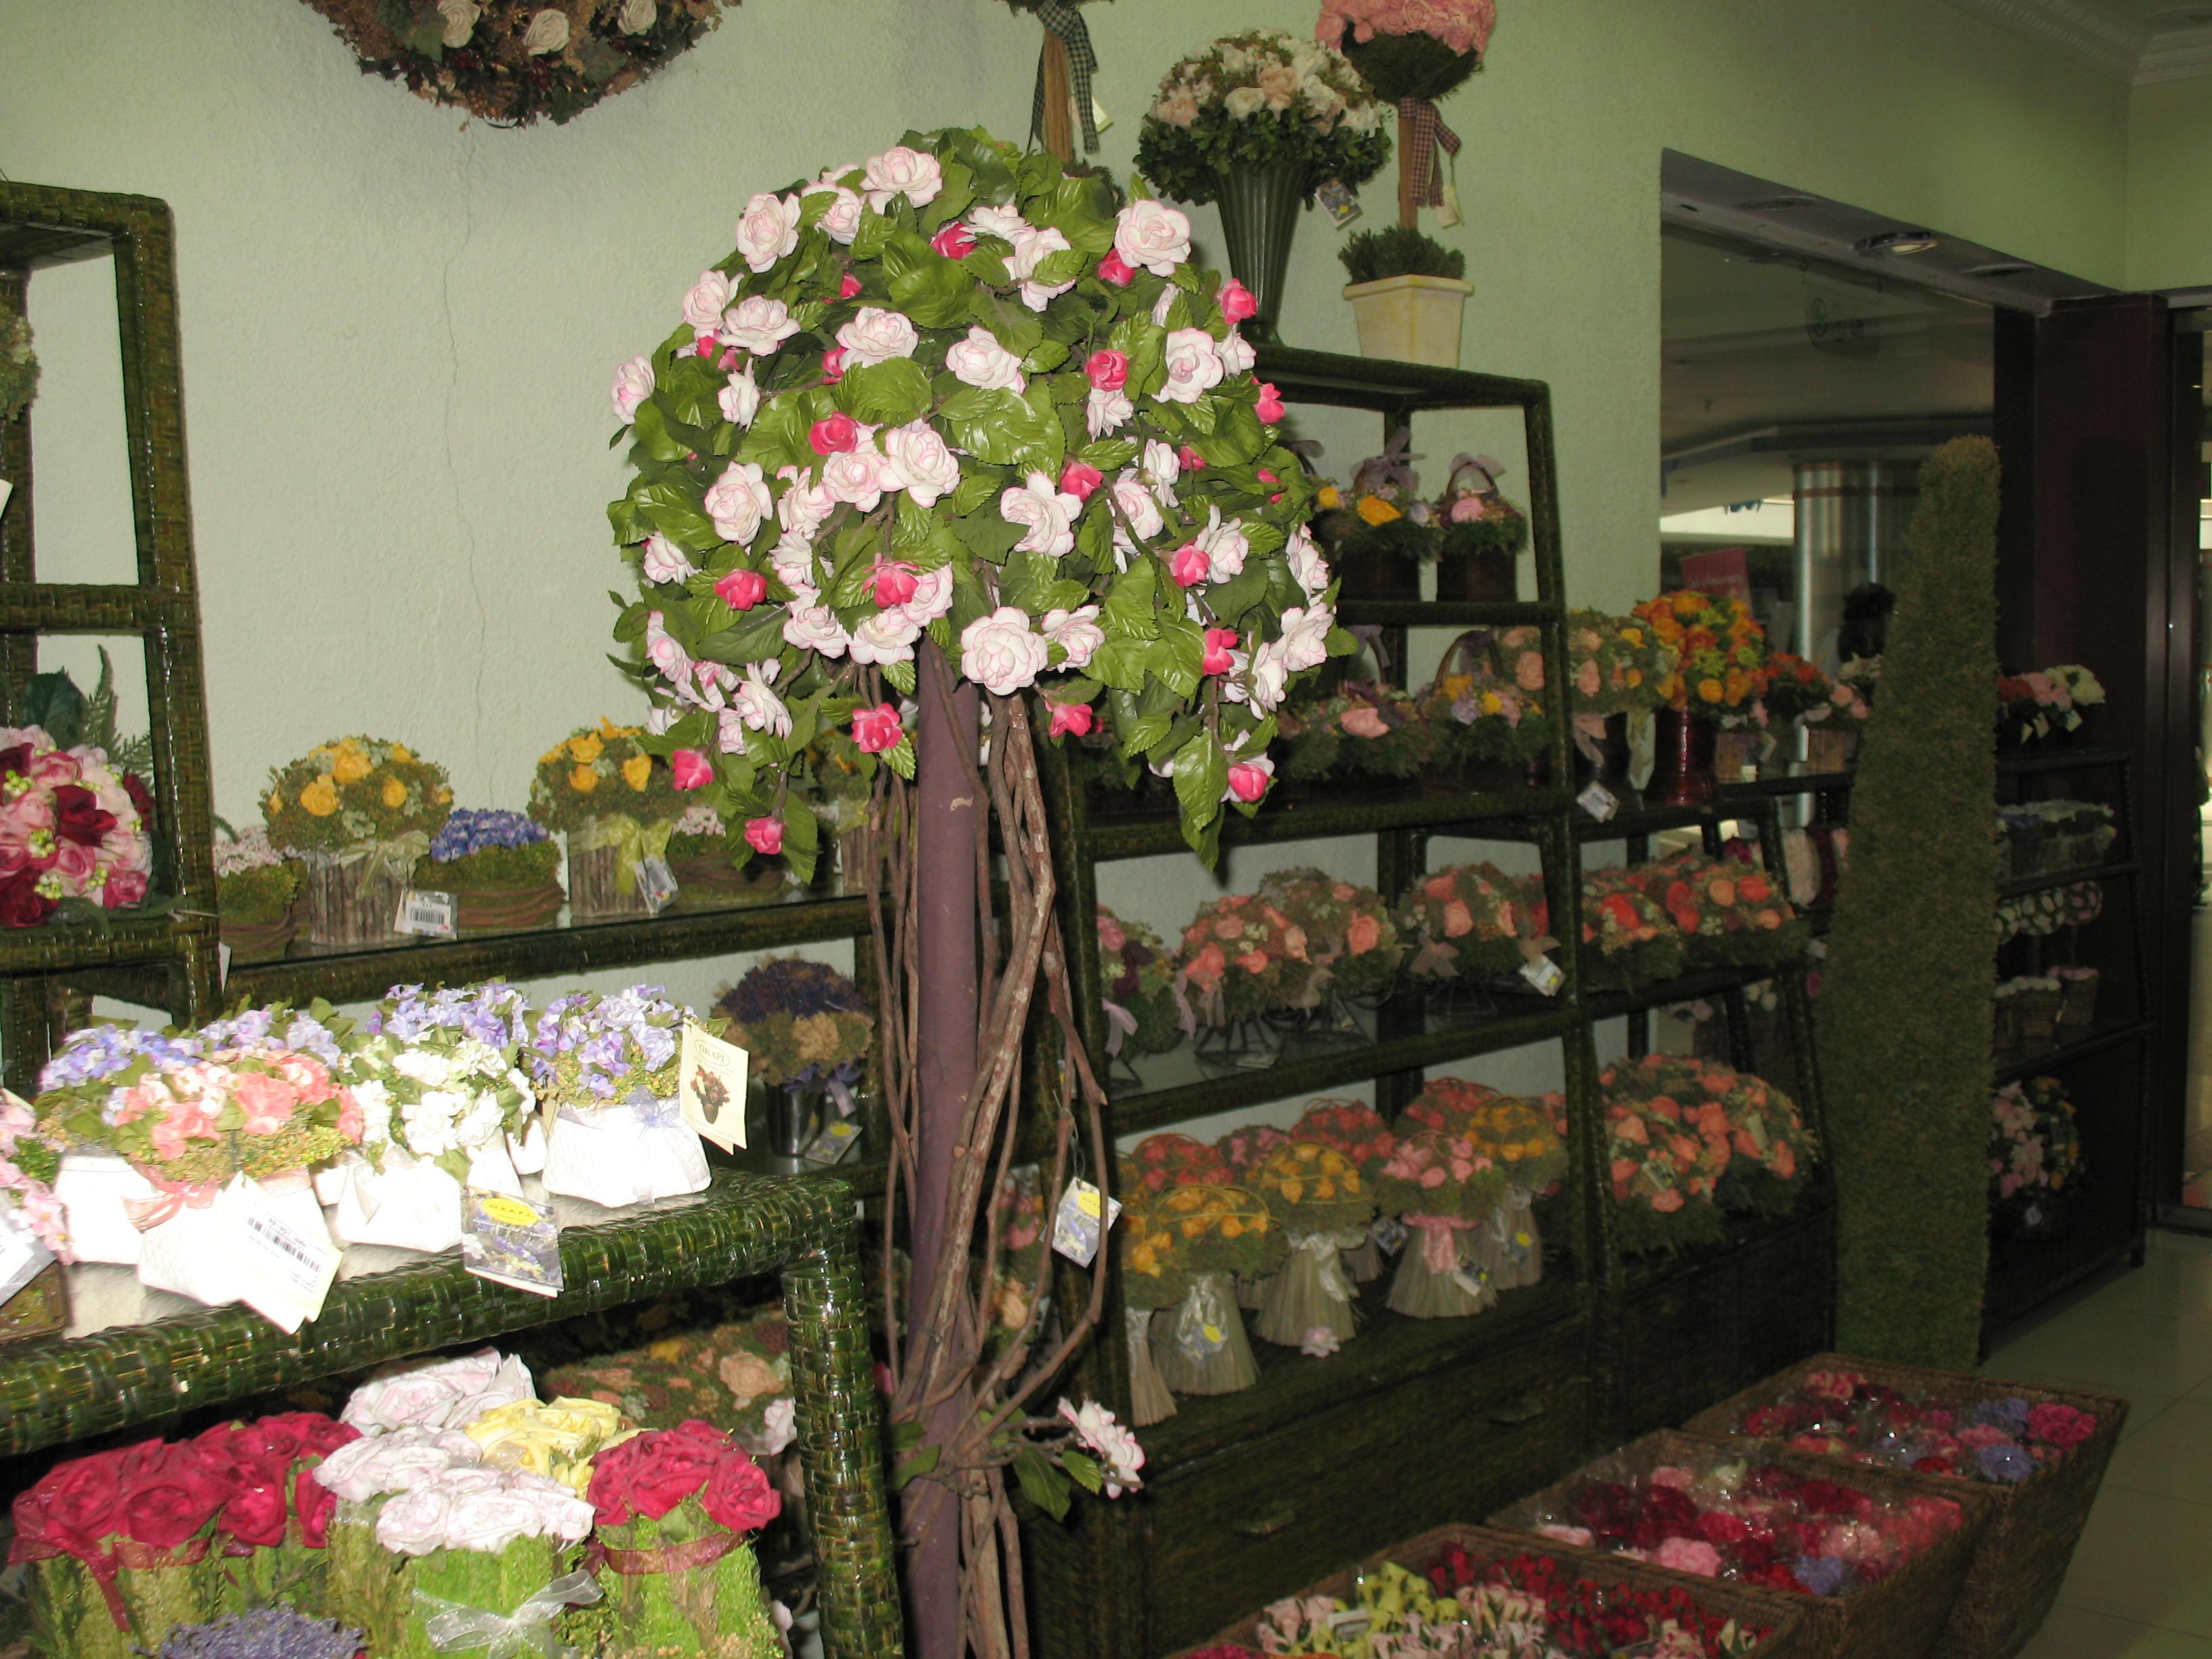 ������������artificial flowersjpg ��������������������